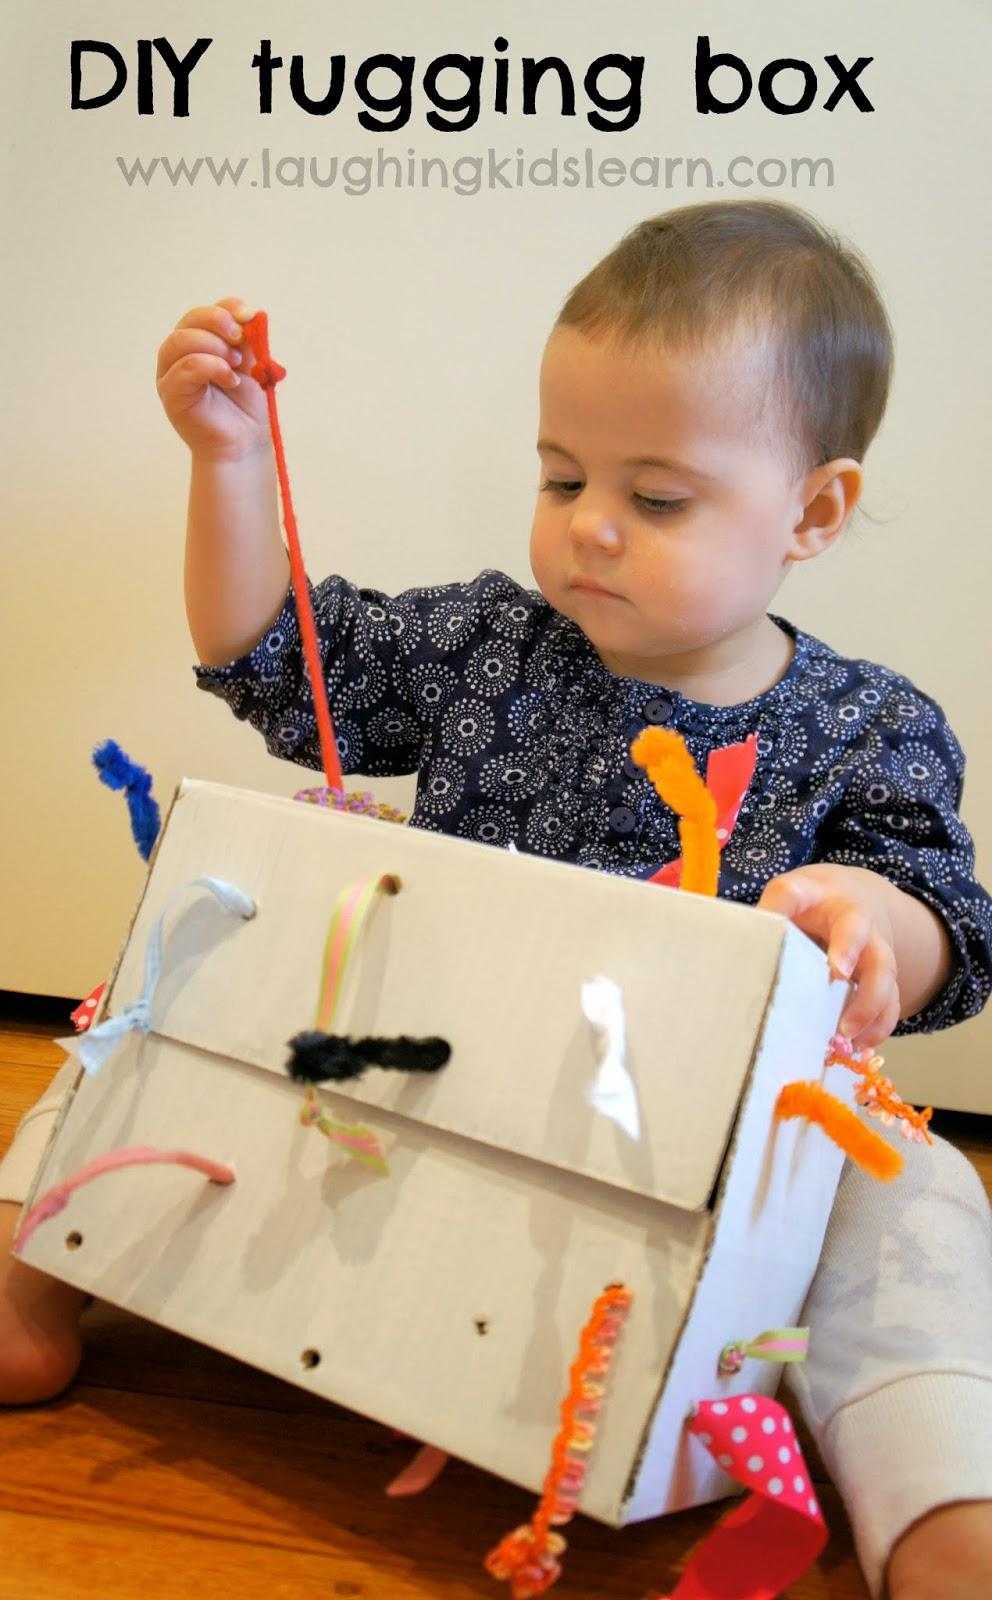 Diy Tugging Box For Fine Motor Development Laughing Kids Learn